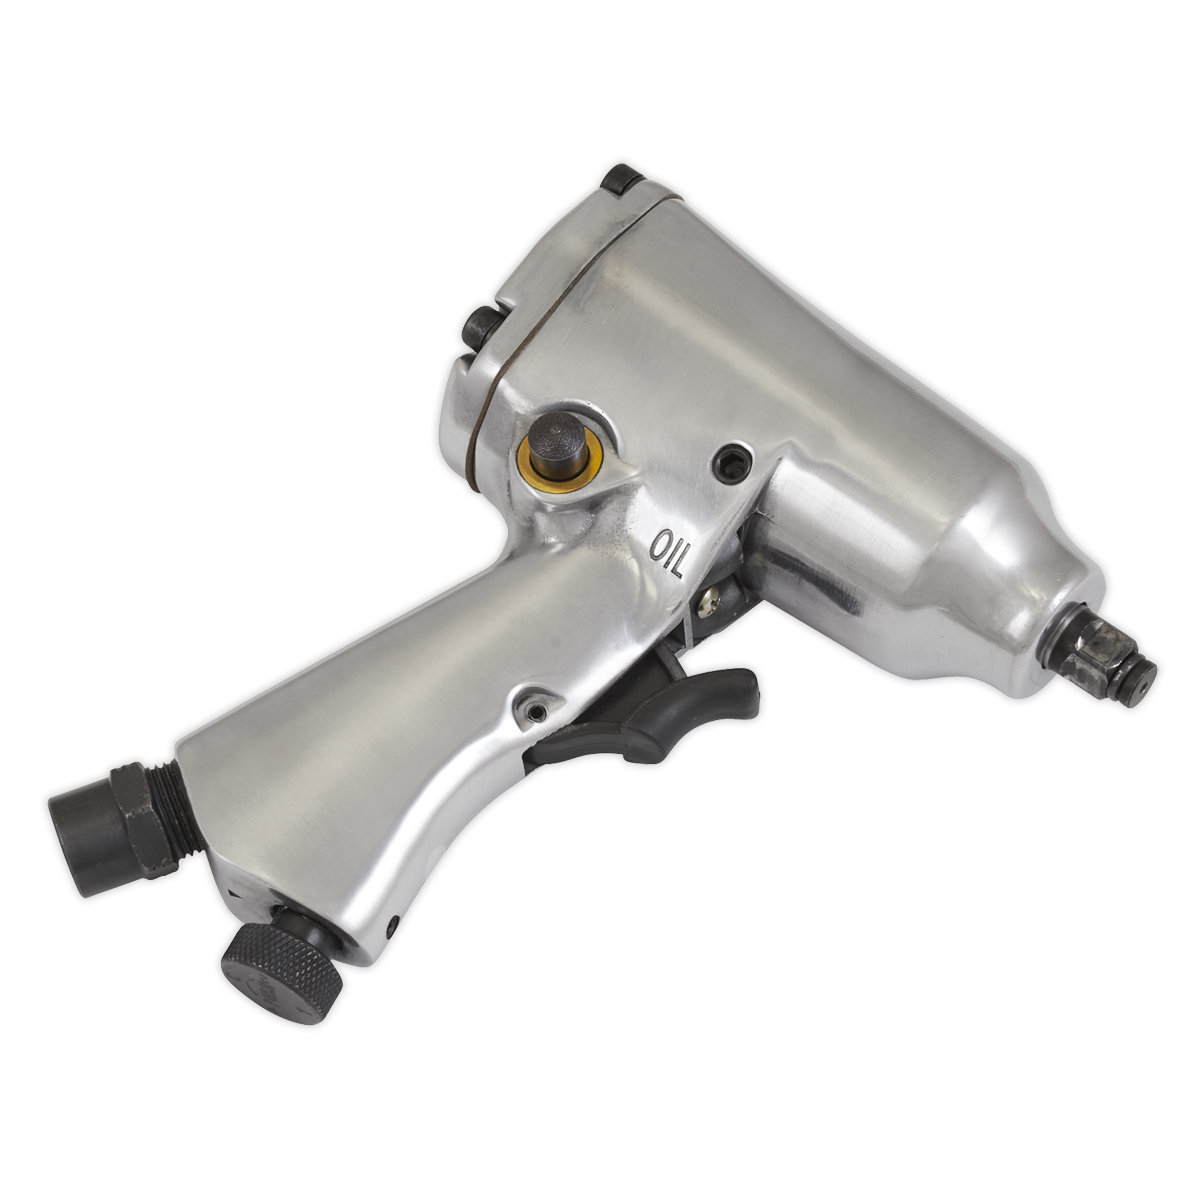 "Air Impact Wrench 3/8""Sq Drive Heavy-Duty"